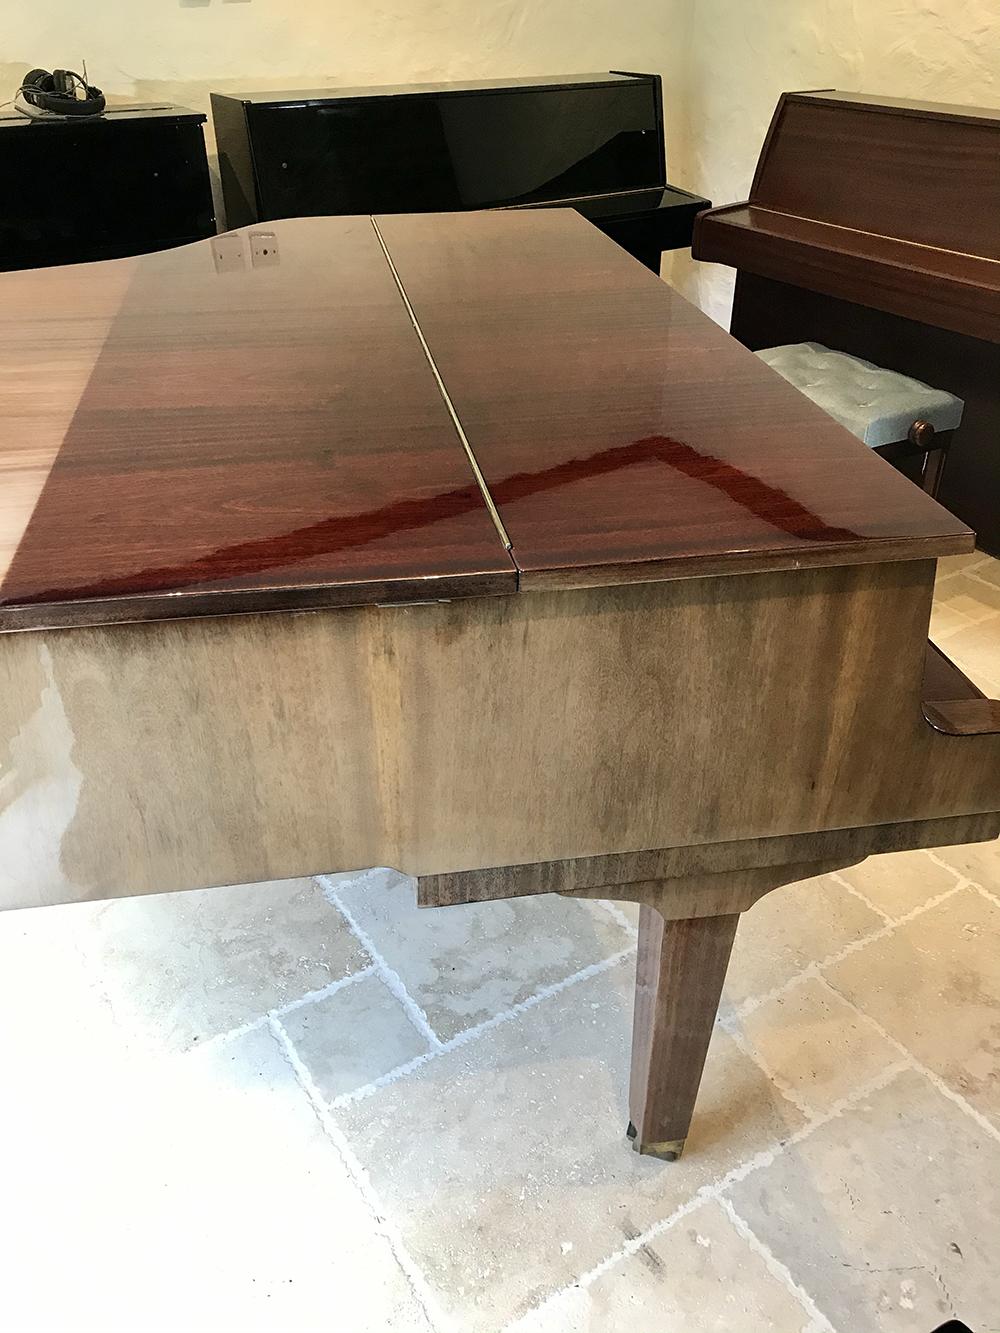 used-petrof-baby-grand-Piano-Dorset-for-sale-15.jpg